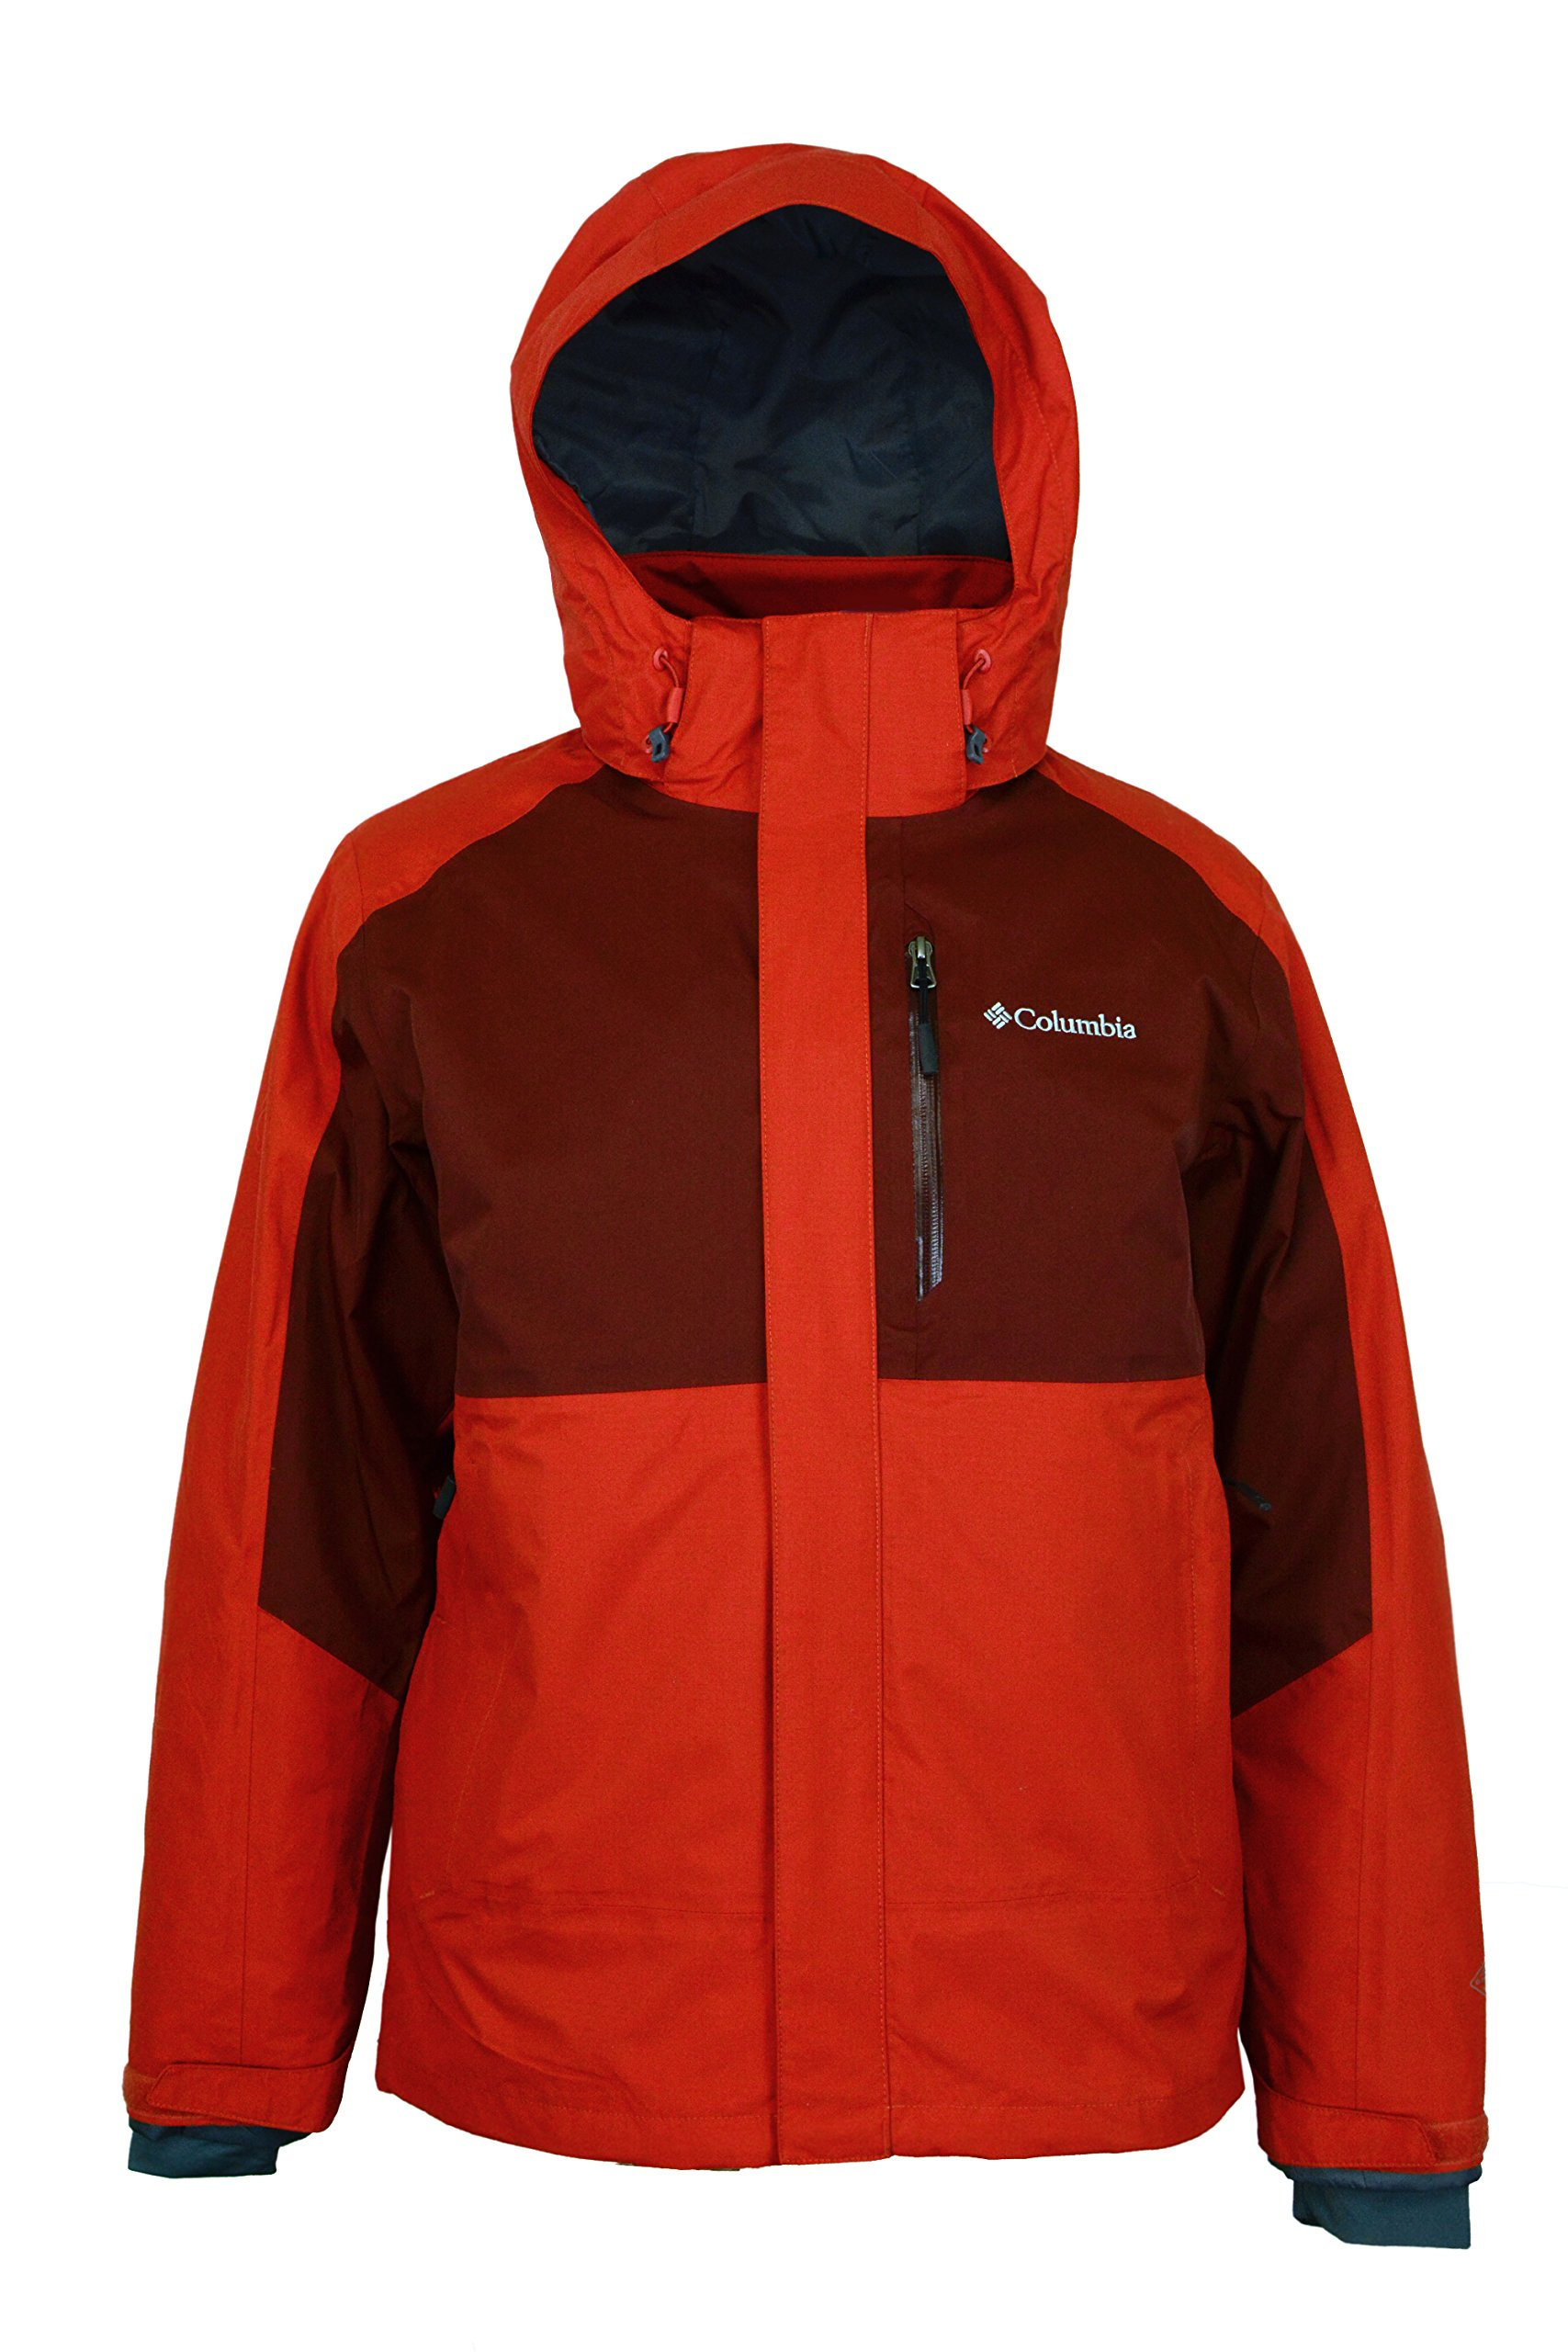 Columbia Omni-Tech Rural Mountain II 3-in-1 Interchange 2017 Mens Jacket (M) by Columbia